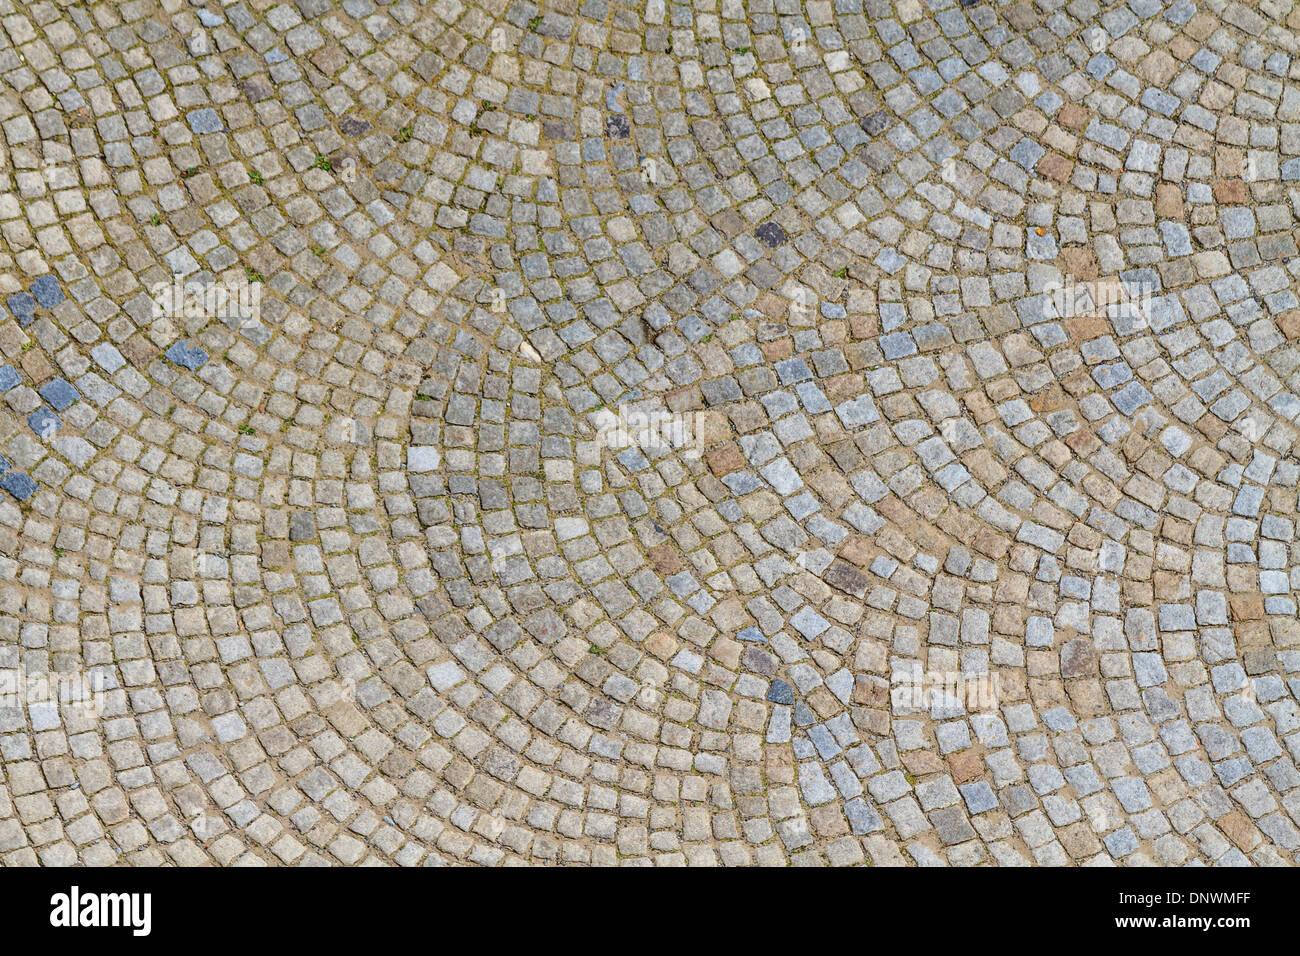 Granite Cobblestone Street Pavement (texture) - Stock Image